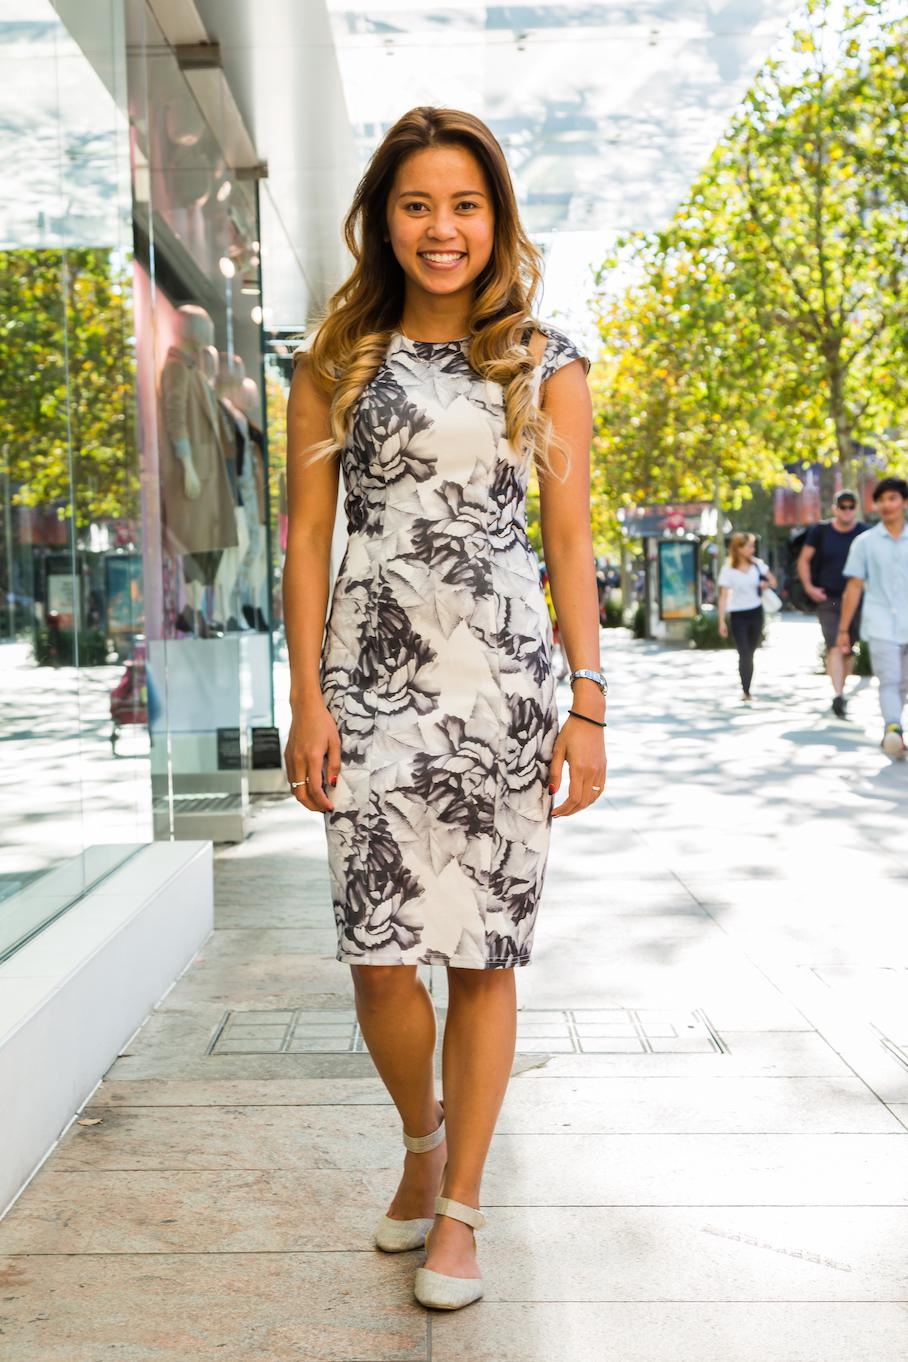 "WA: Dollvina Van Luyn, Make-Up Artist, I love body con dresses that can enhance my figure."" Photo: <a href=""http://www.rahstudios.com.au/street-style.html/"" target=""_blank"">Alain Quah</a>"